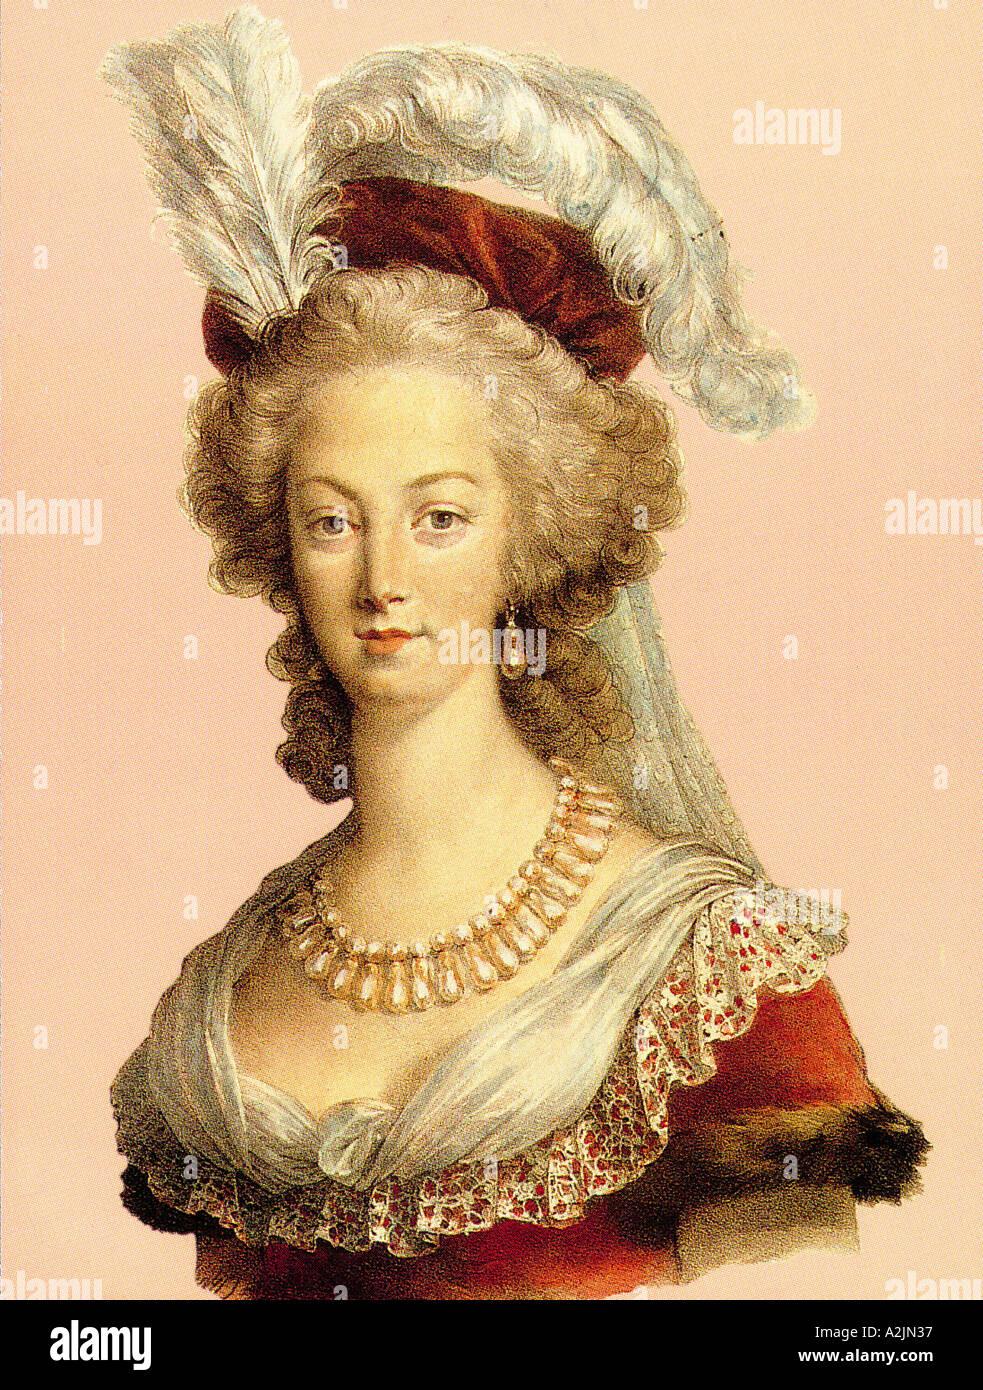 MARIE ANTOINETTE Queen of France 1755 1793 - Stock Image